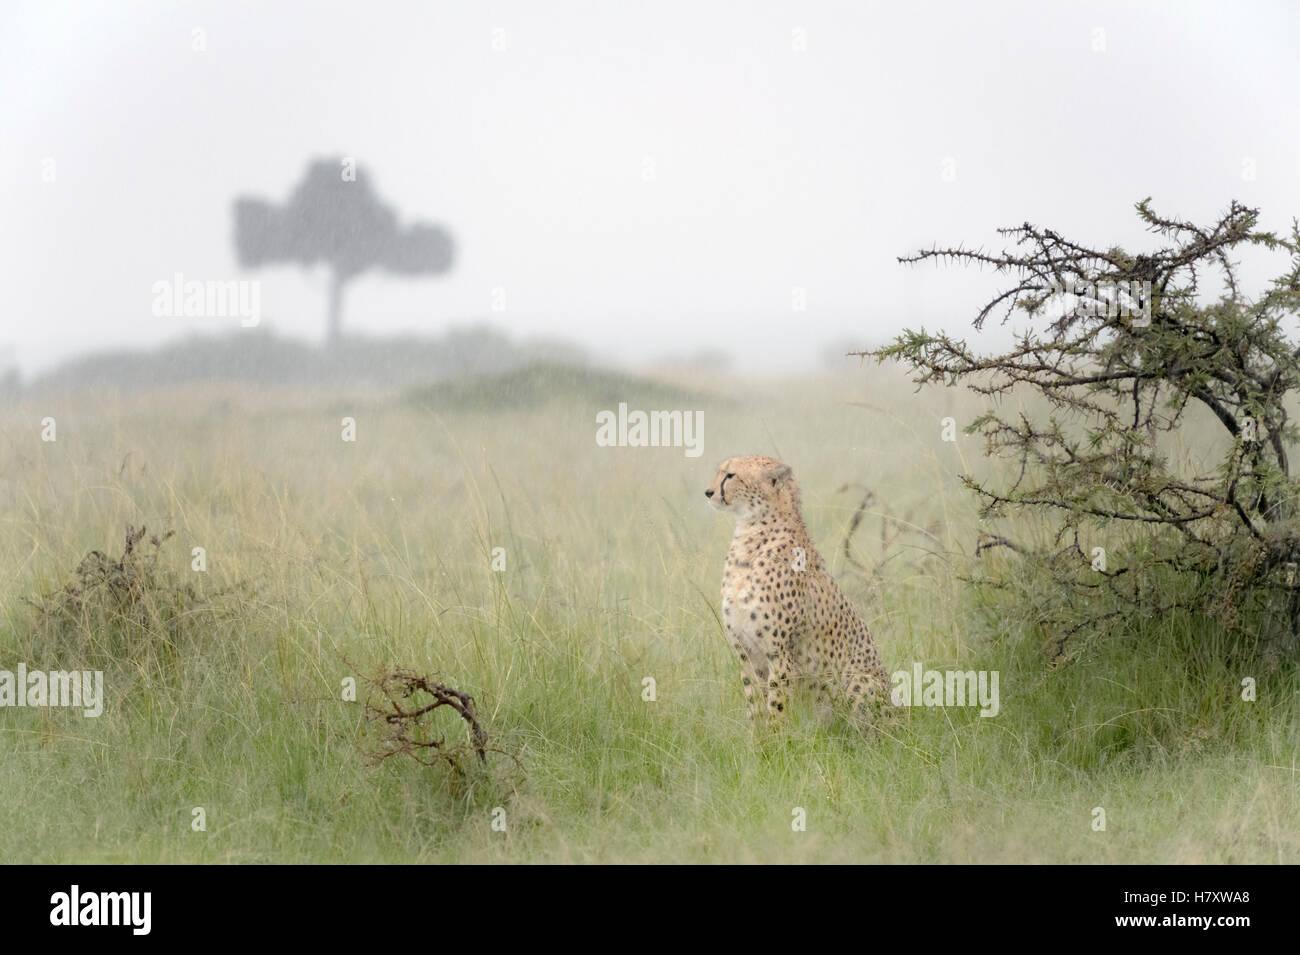 Ghepardo (Acinonix jubatus) seduti sulla savana durante la pioggia, il Masai Mara riserva nazionale, Kenya Immagini Stock